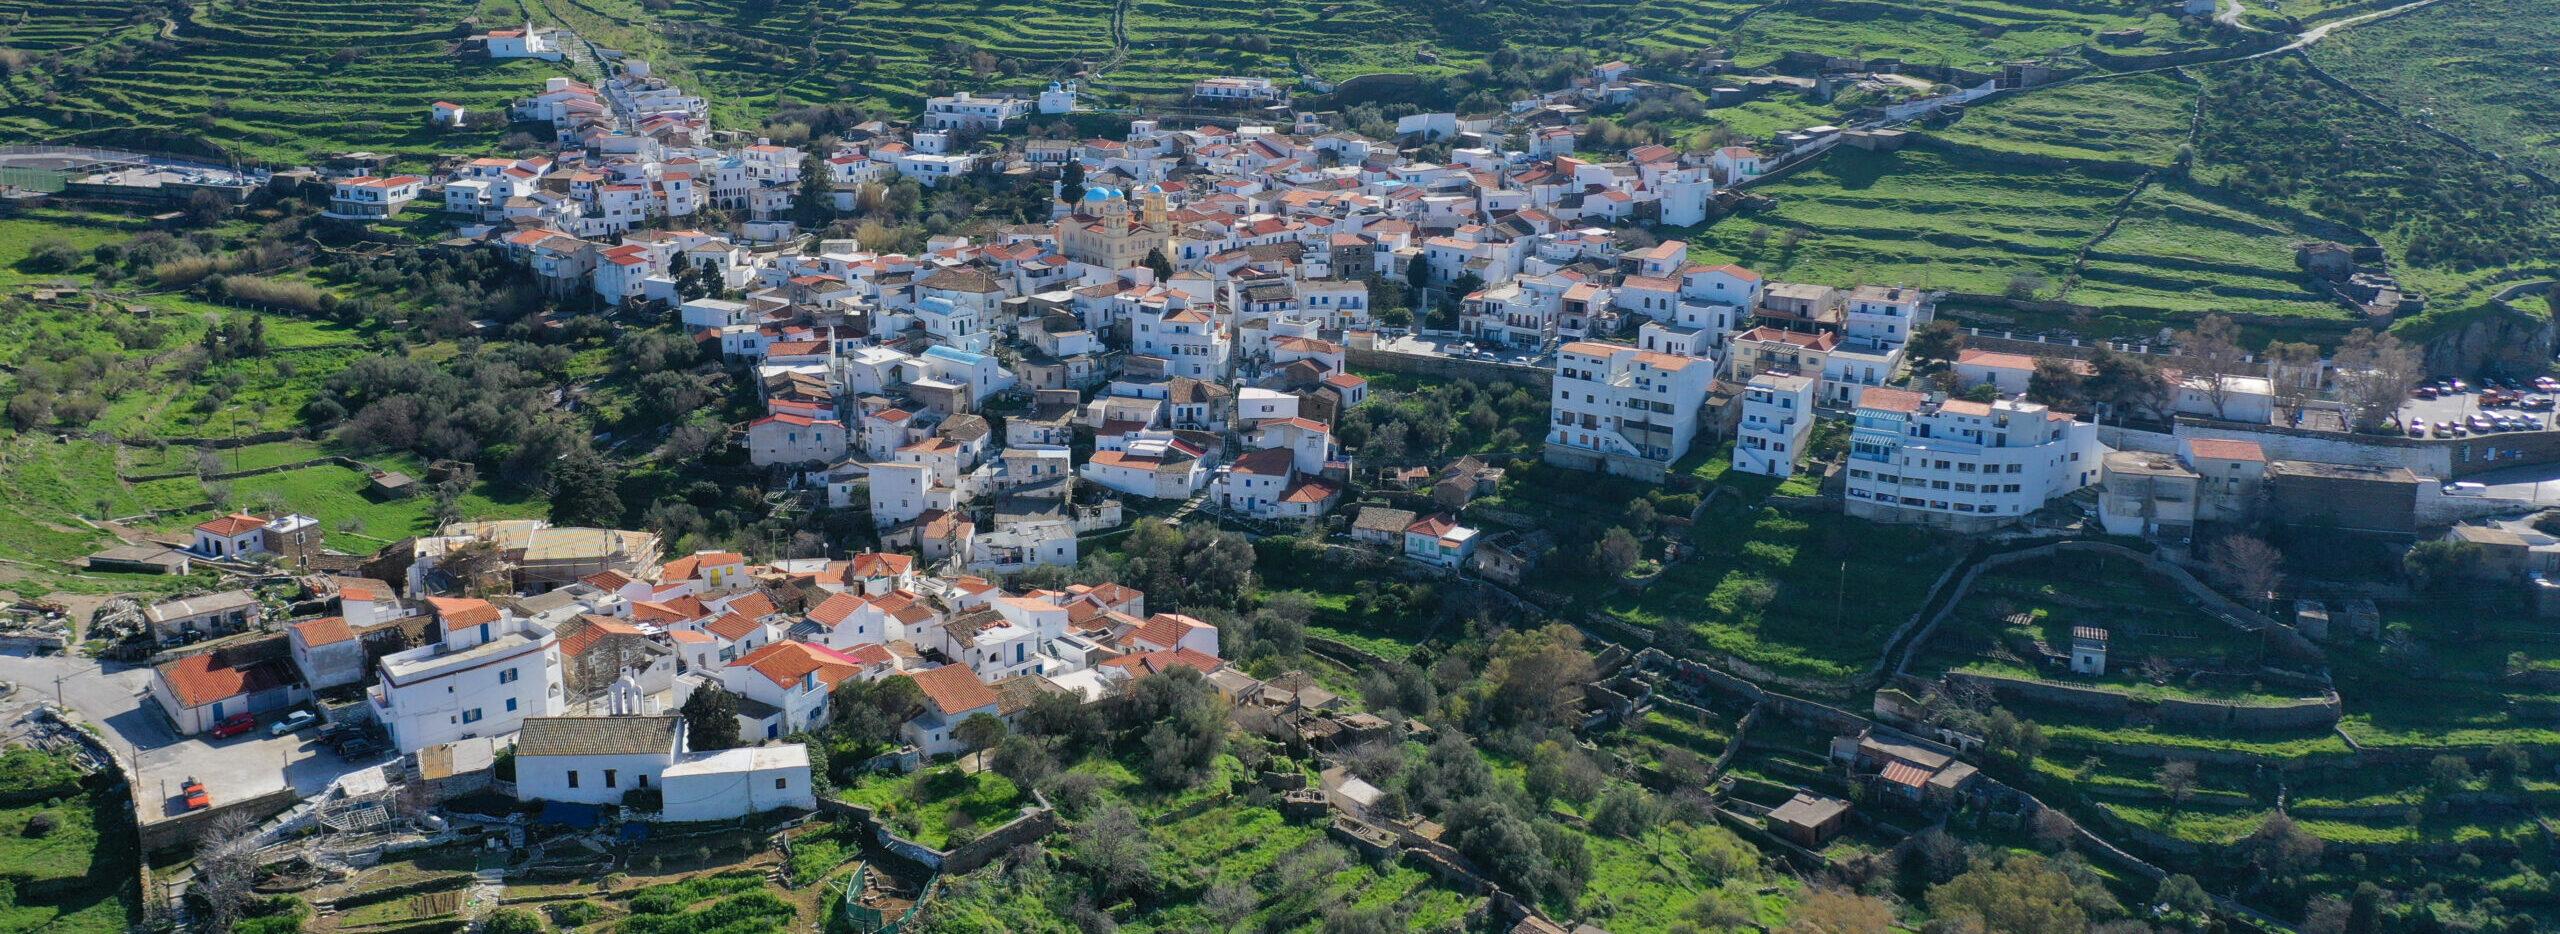 Kythnos: The labyrinth village